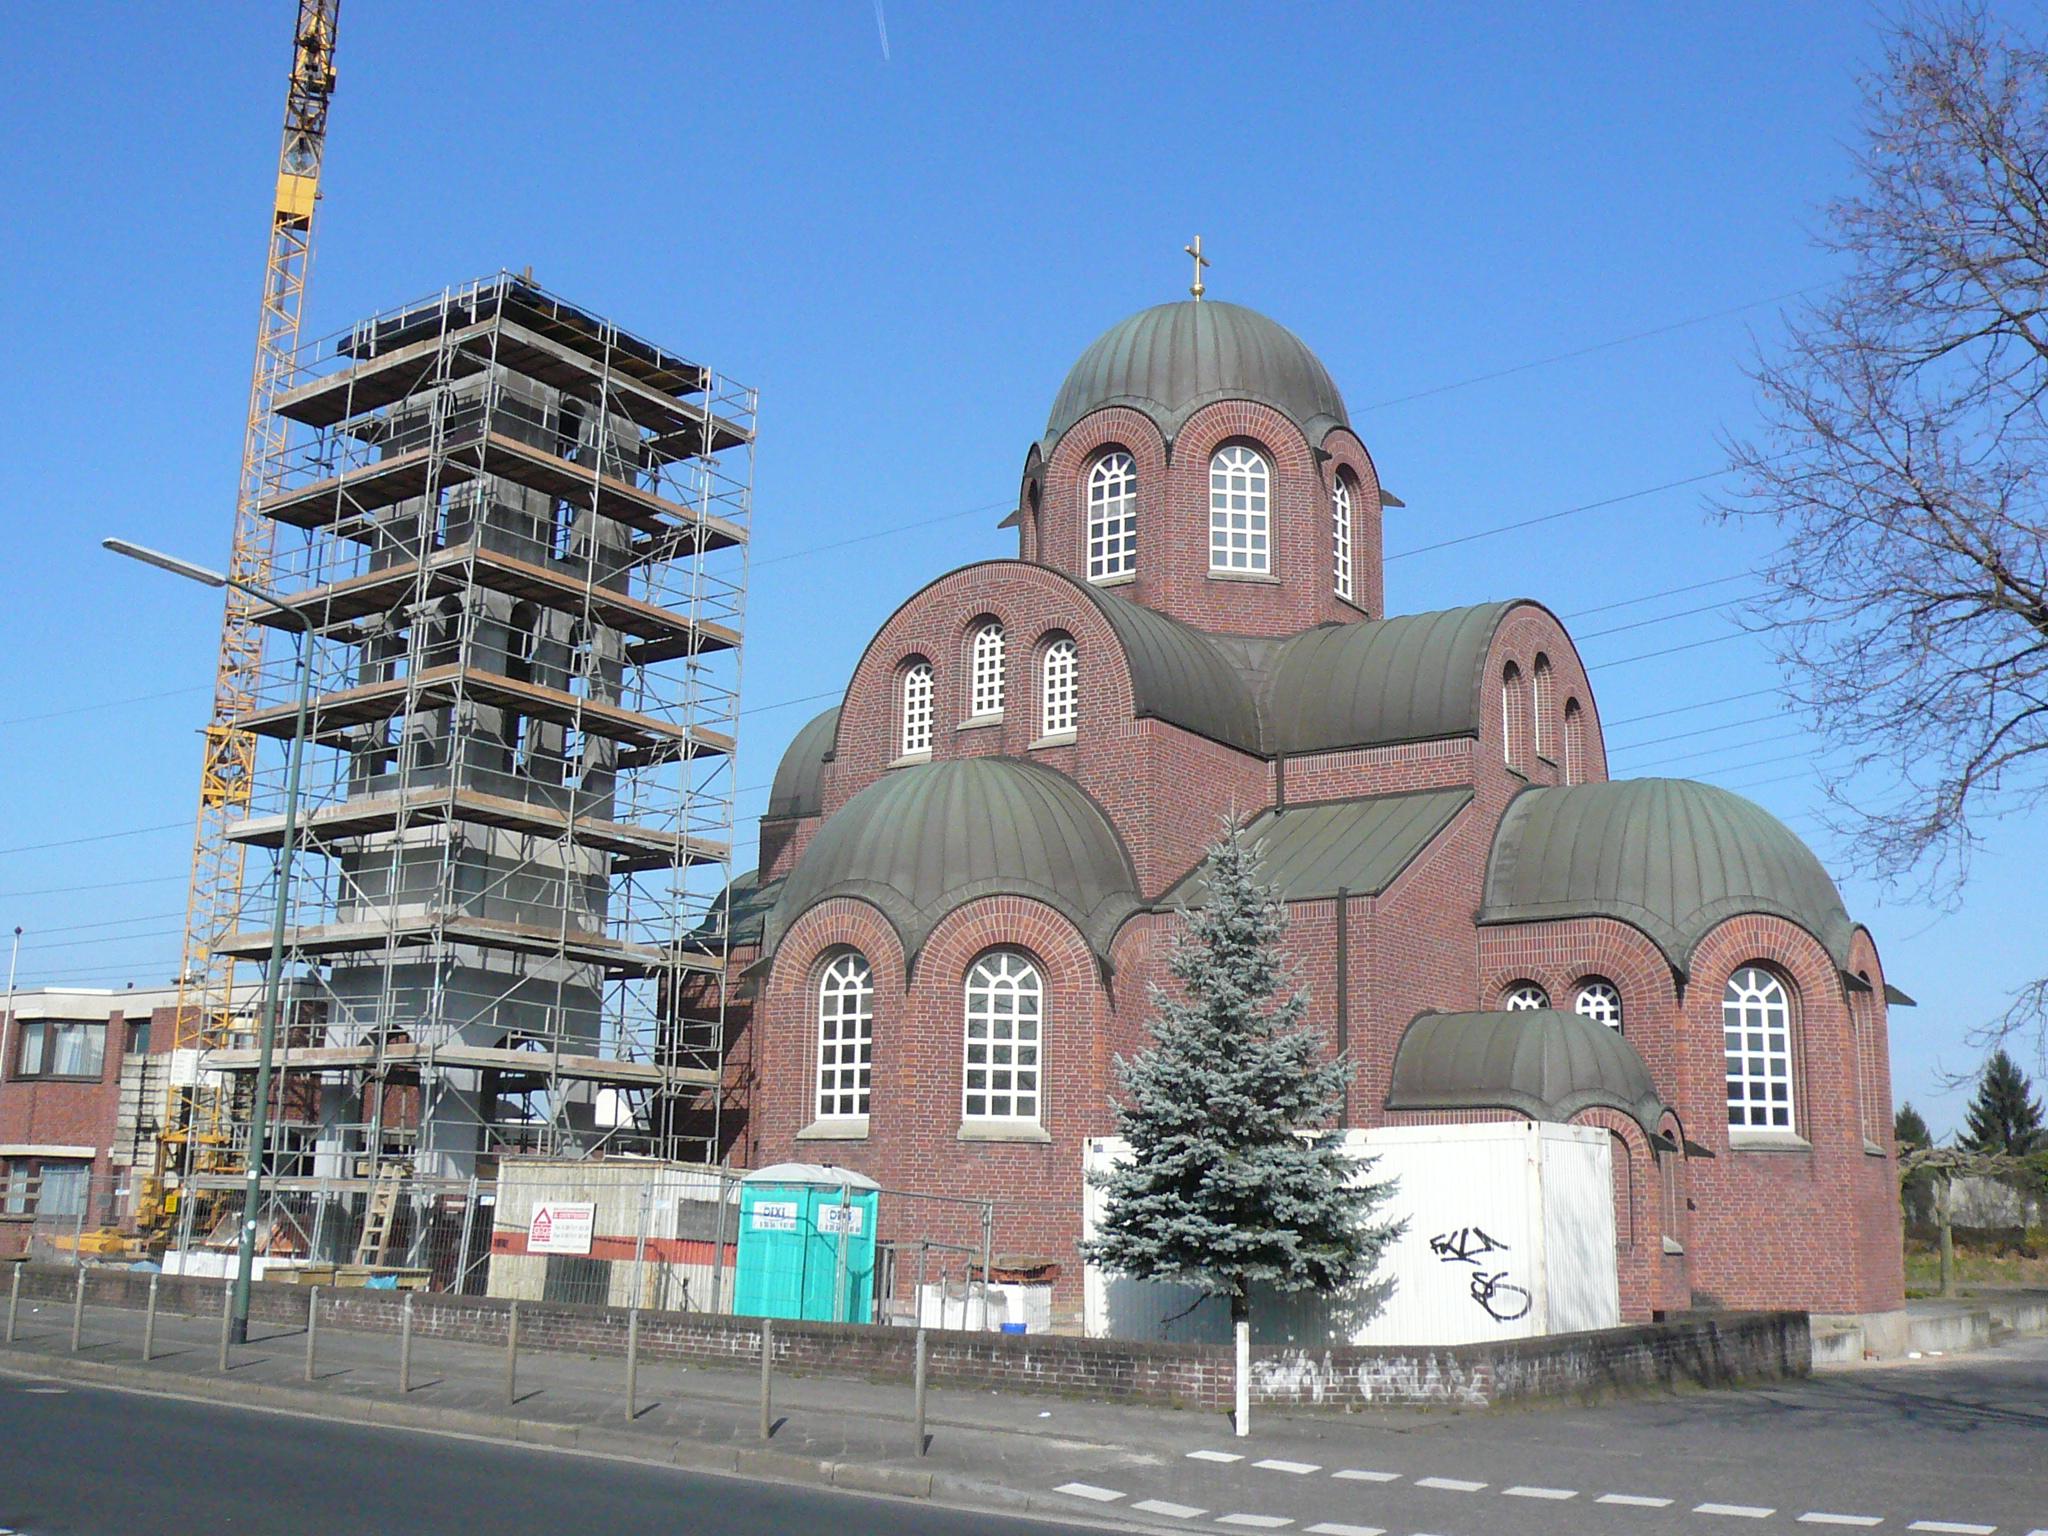 File:Griechisch-orthdoxe Kirche Düsseldorf.JPG - Wikimedia